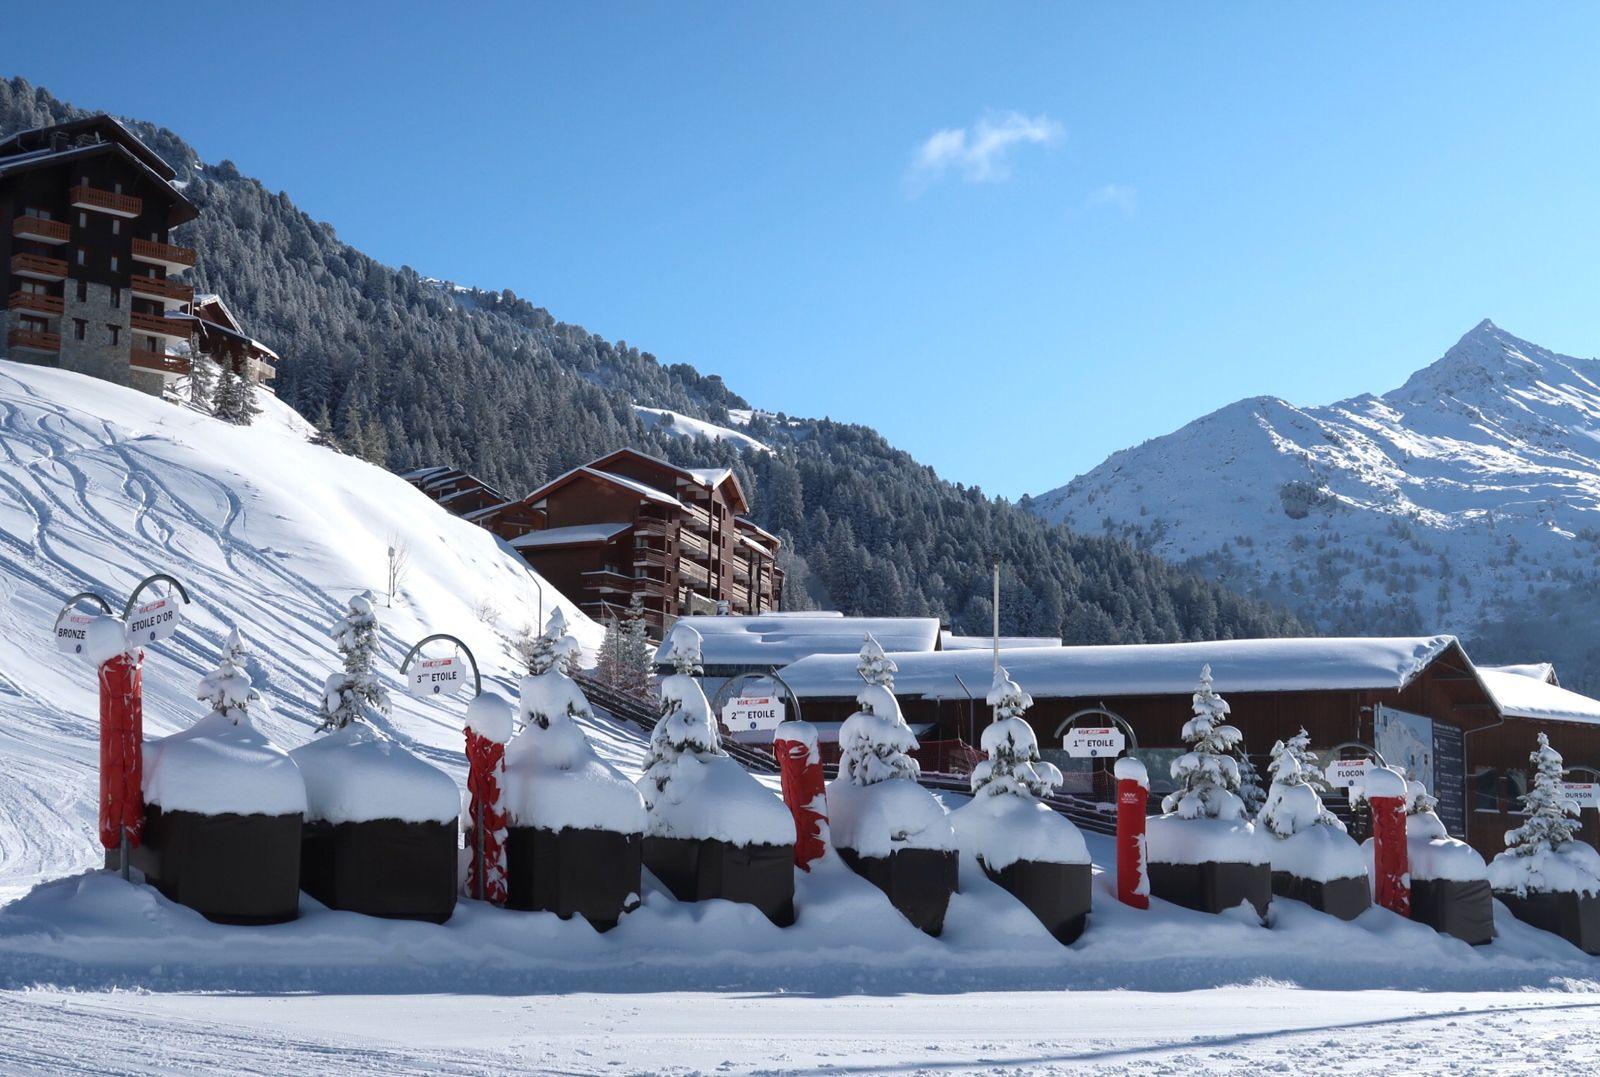 Live: verse sneeuw, zon en rustige pistes in Les Trois Vallées